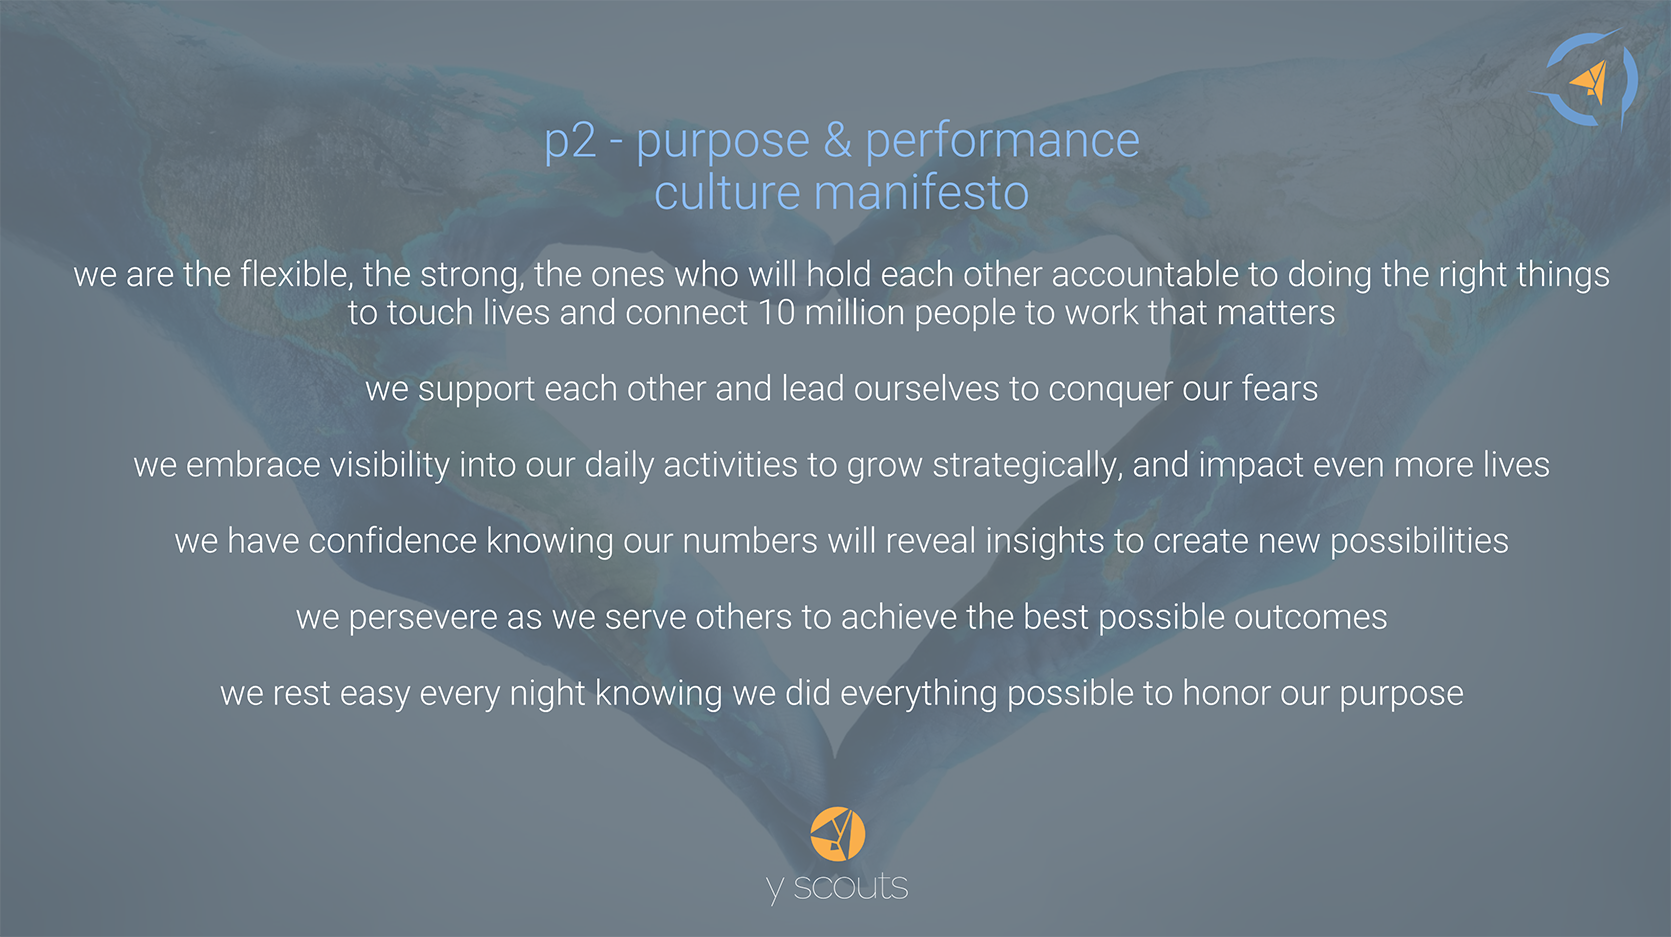 P2manifesto.png